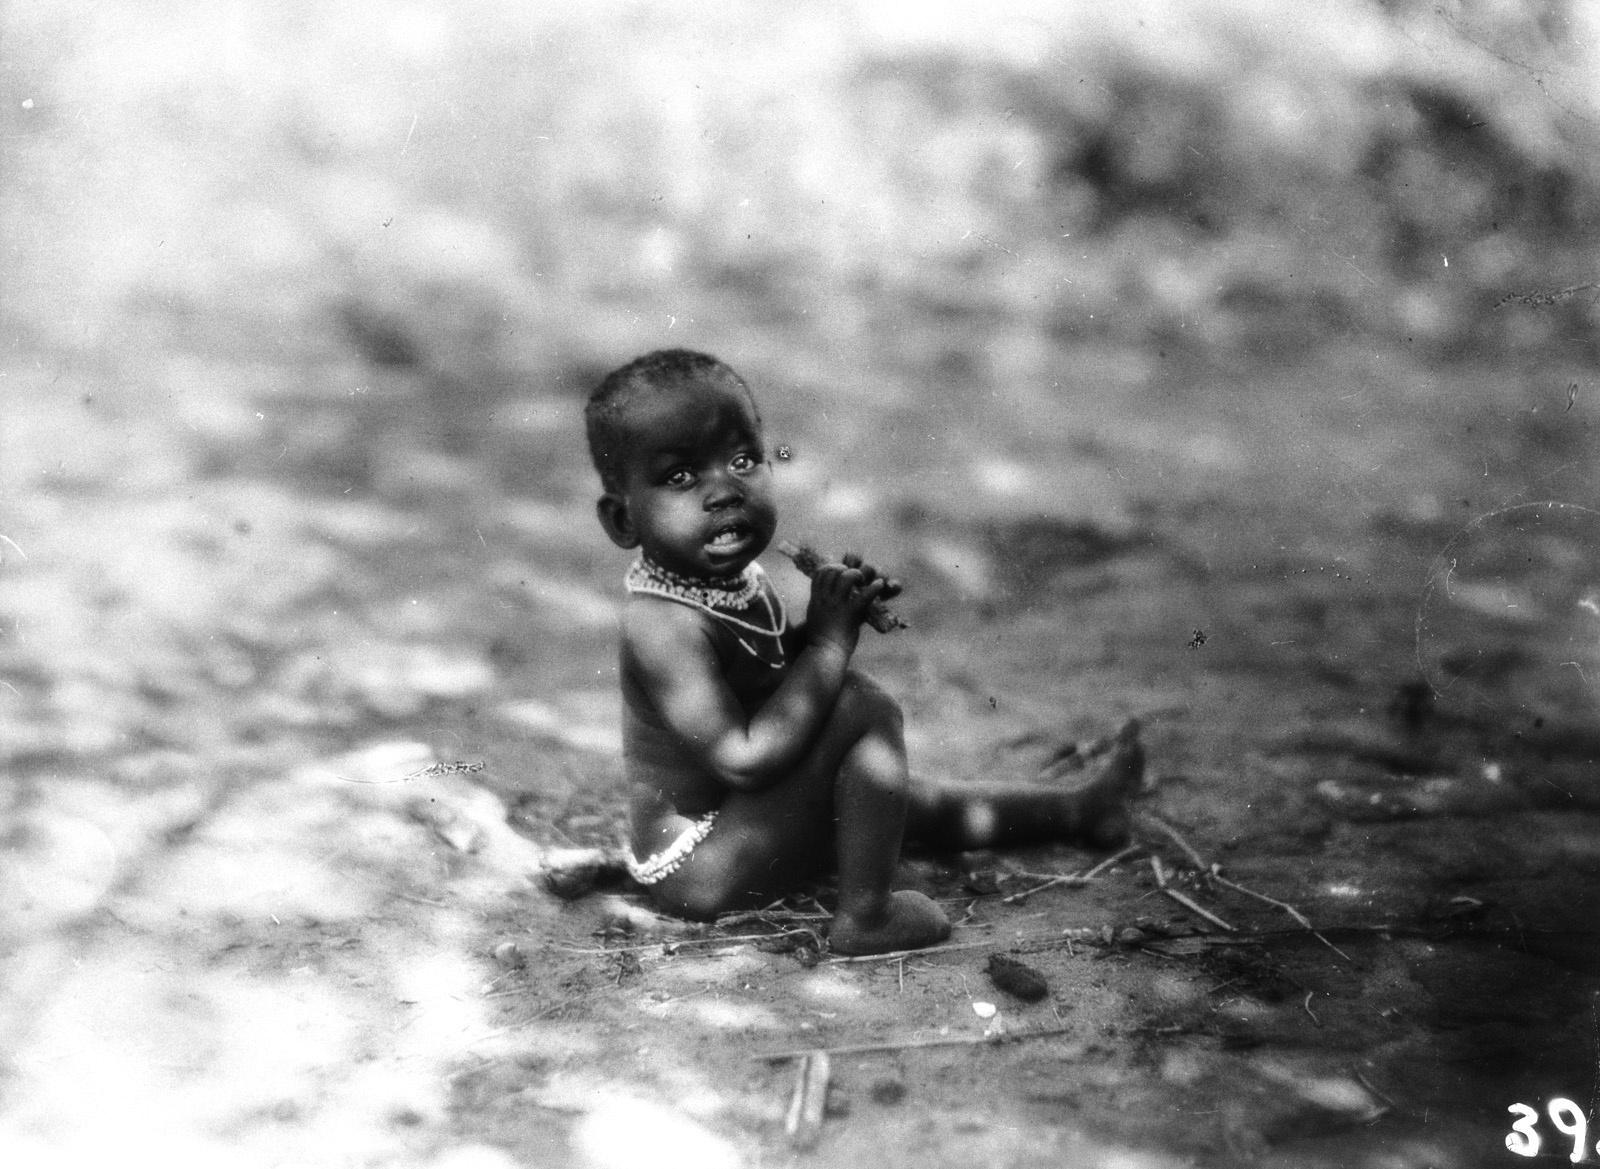 Квазулу-Наталь. Умфолози. Ребенок из народности банту